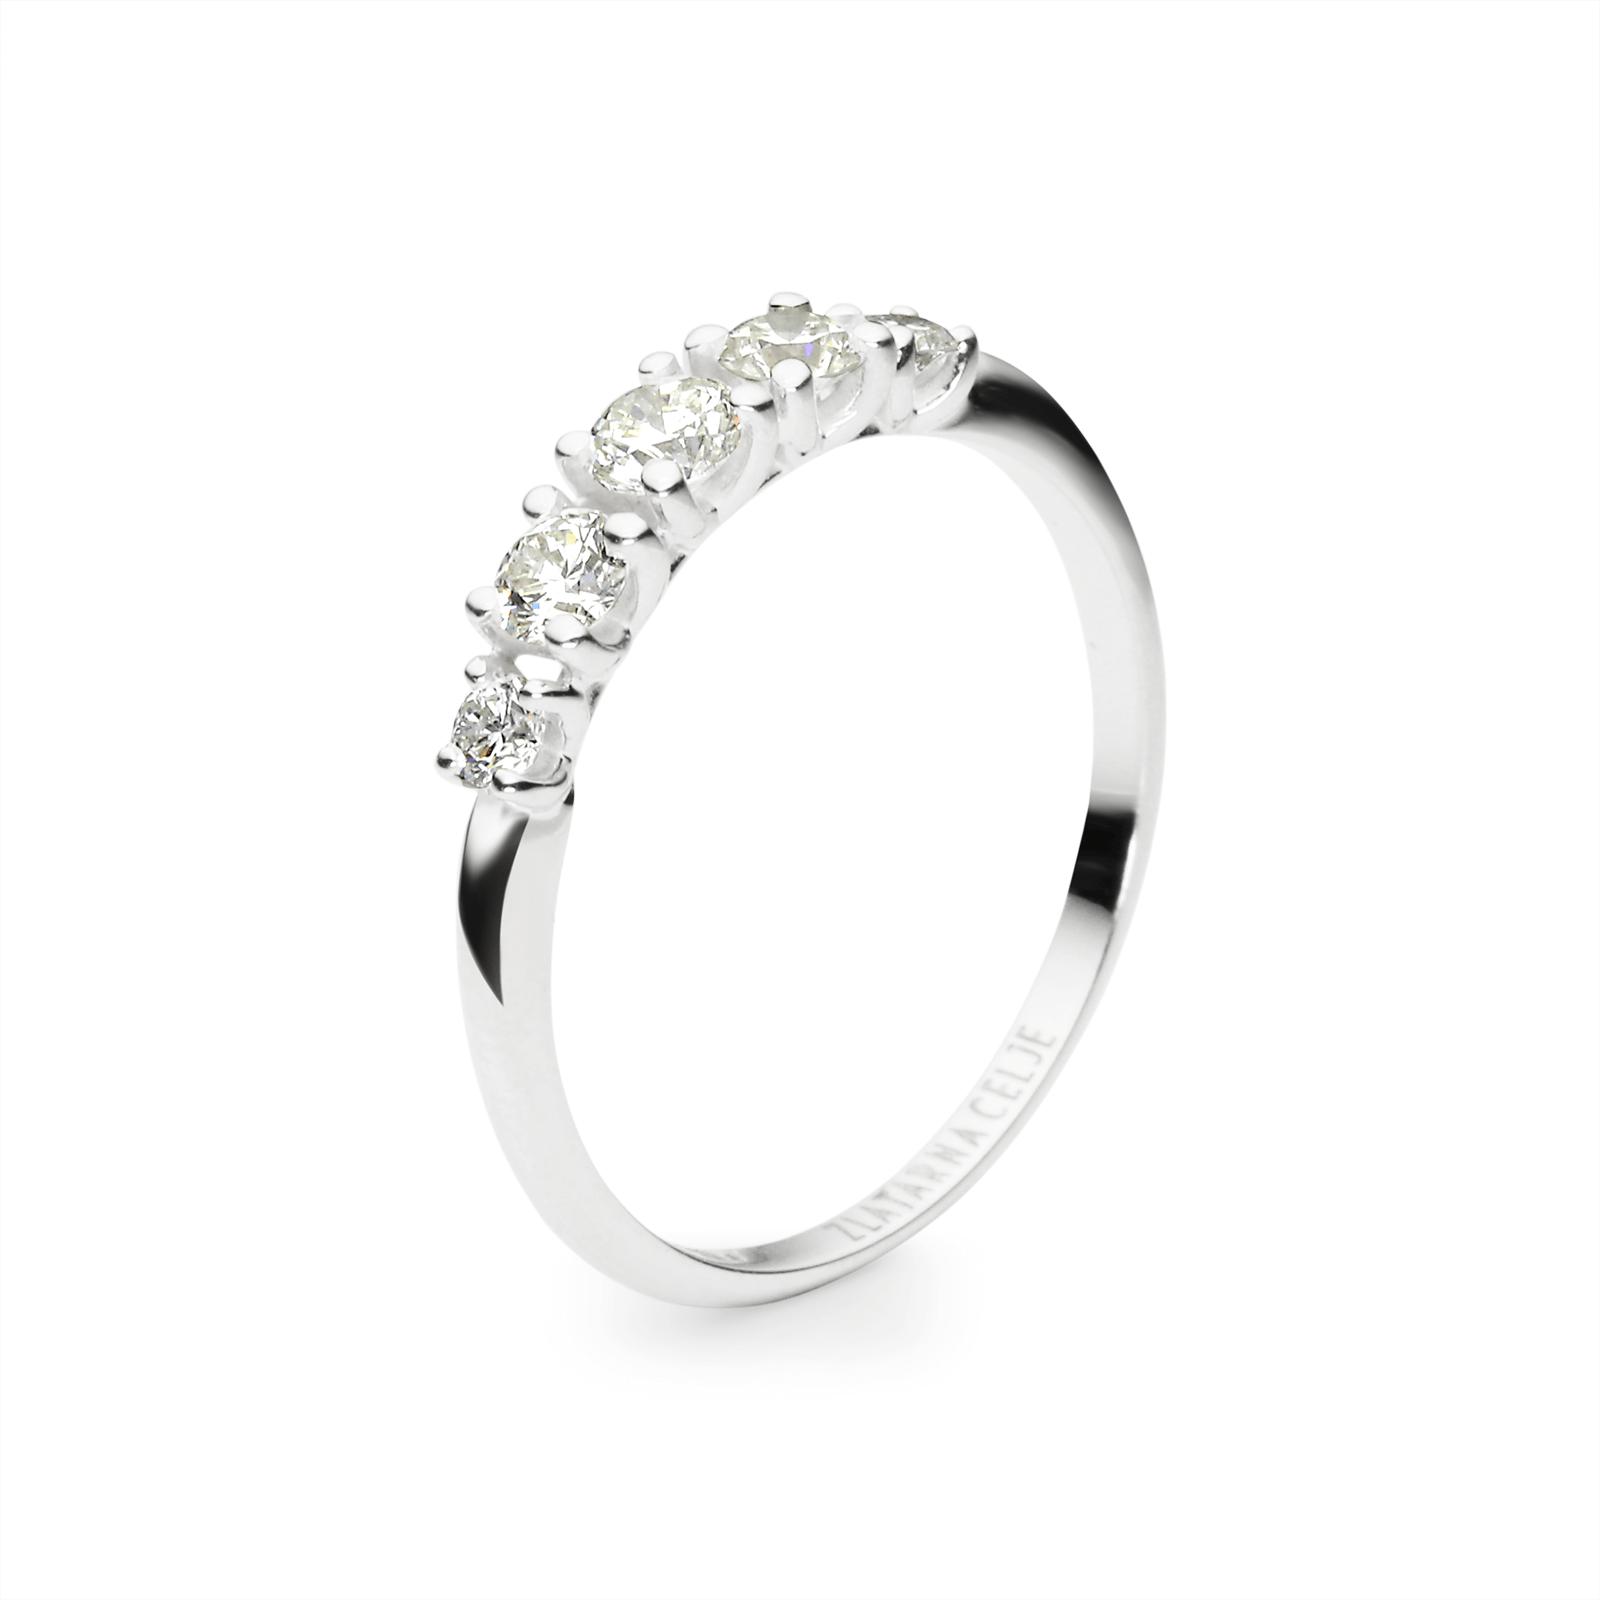 Diamond0,15 ct - 1 x; 0,10 ct - 2 x; 0,05 ct - 2 x